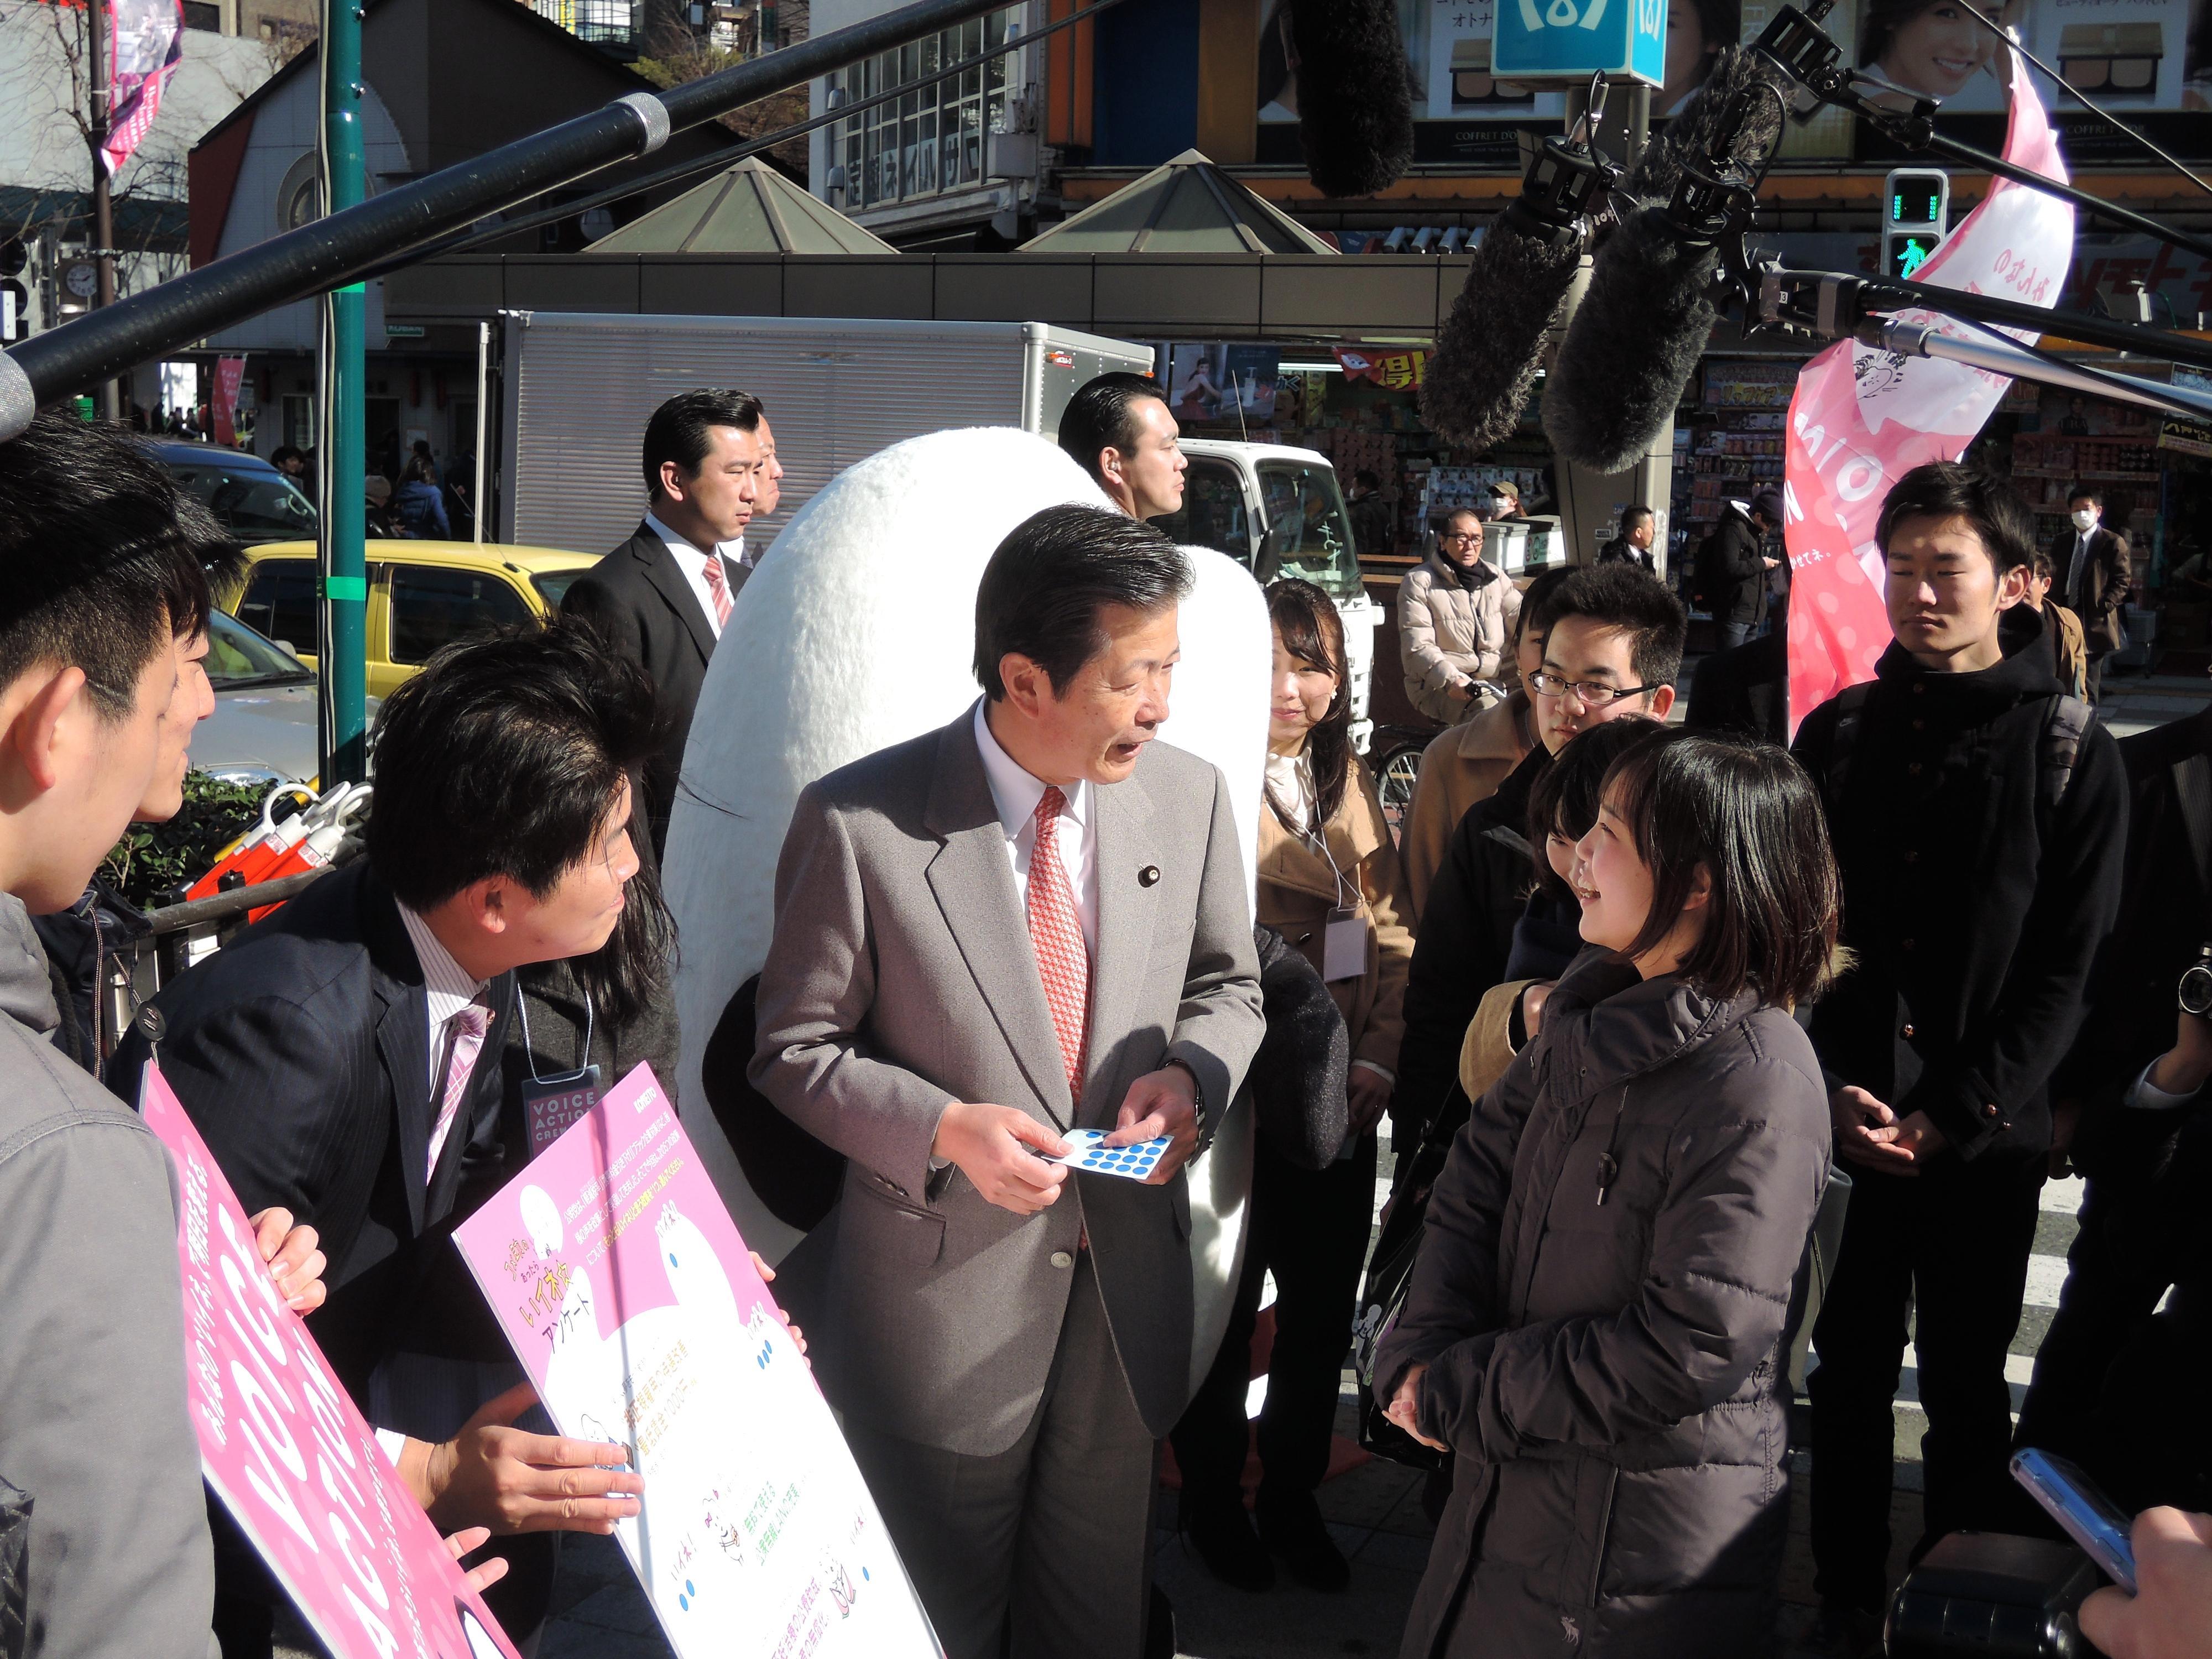 https://www.n-yamaguchi.gr.jp/news/0555a5e47dde298fd4567255be54cafb61f38250.JPG